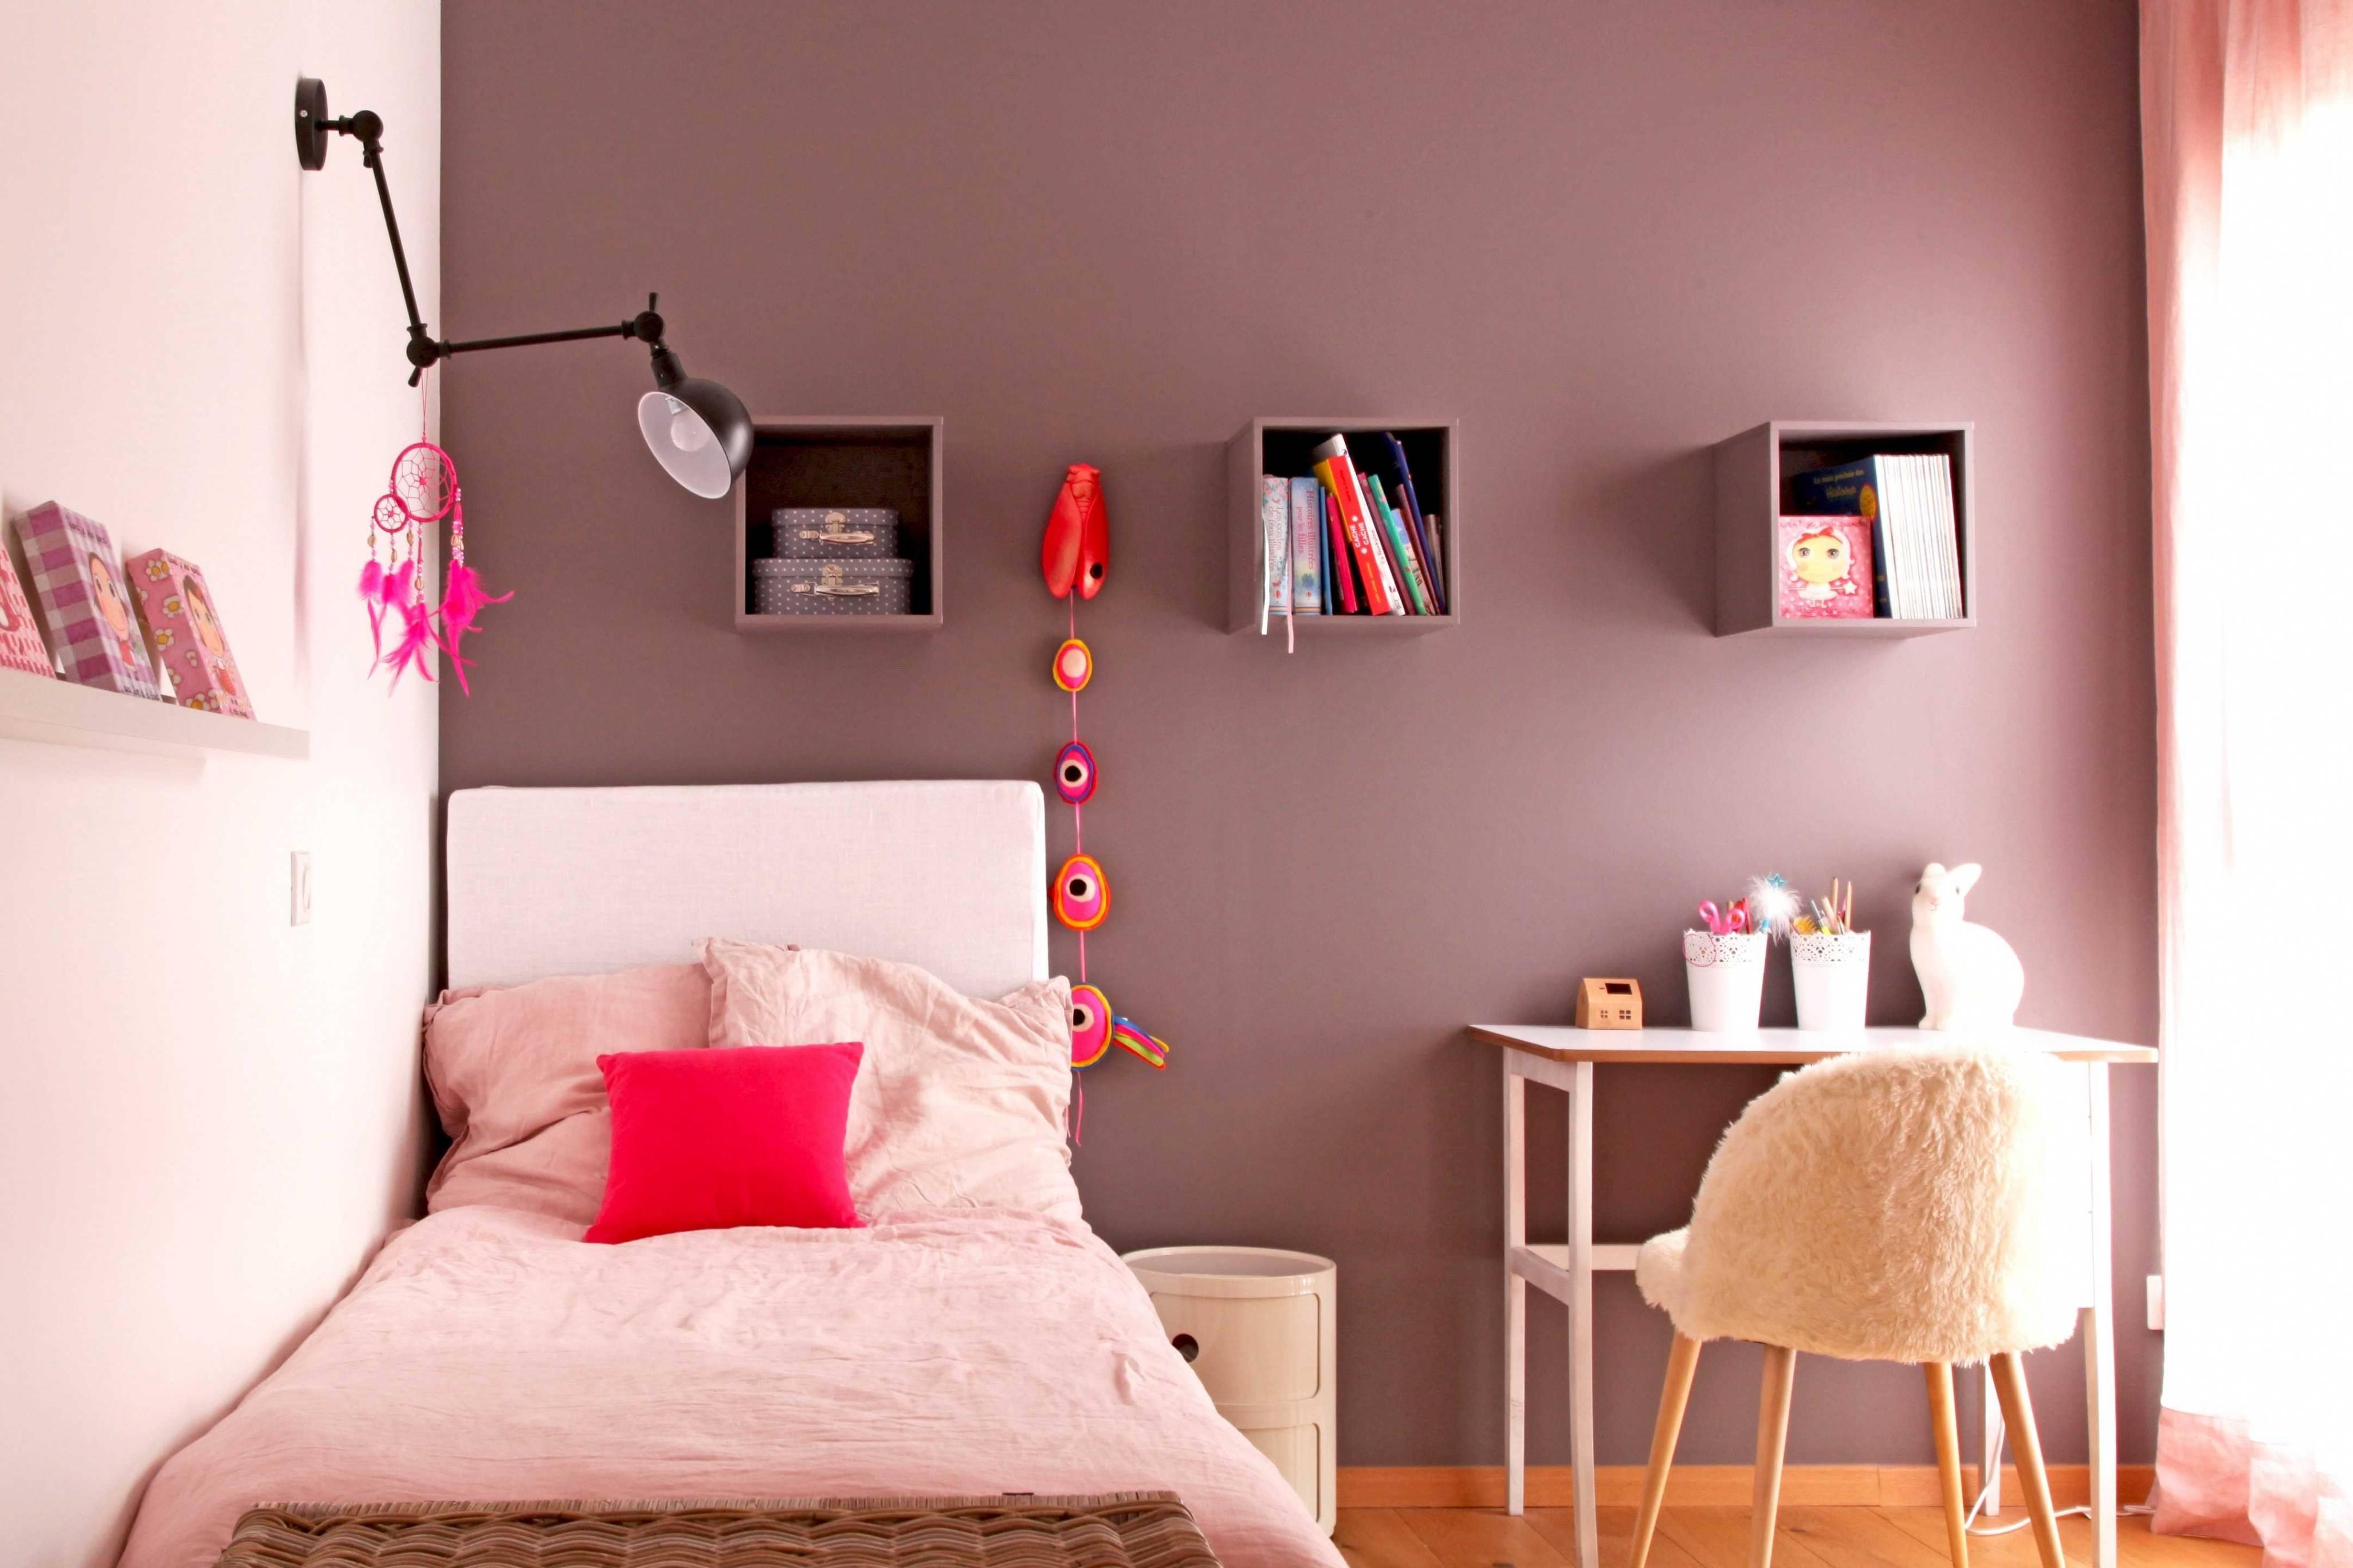 deco chambre fille ado fashion designs avec d c3 a9coration chambre decoration chambre ado fille 16 ans decoration chambre ado fille 16 ans